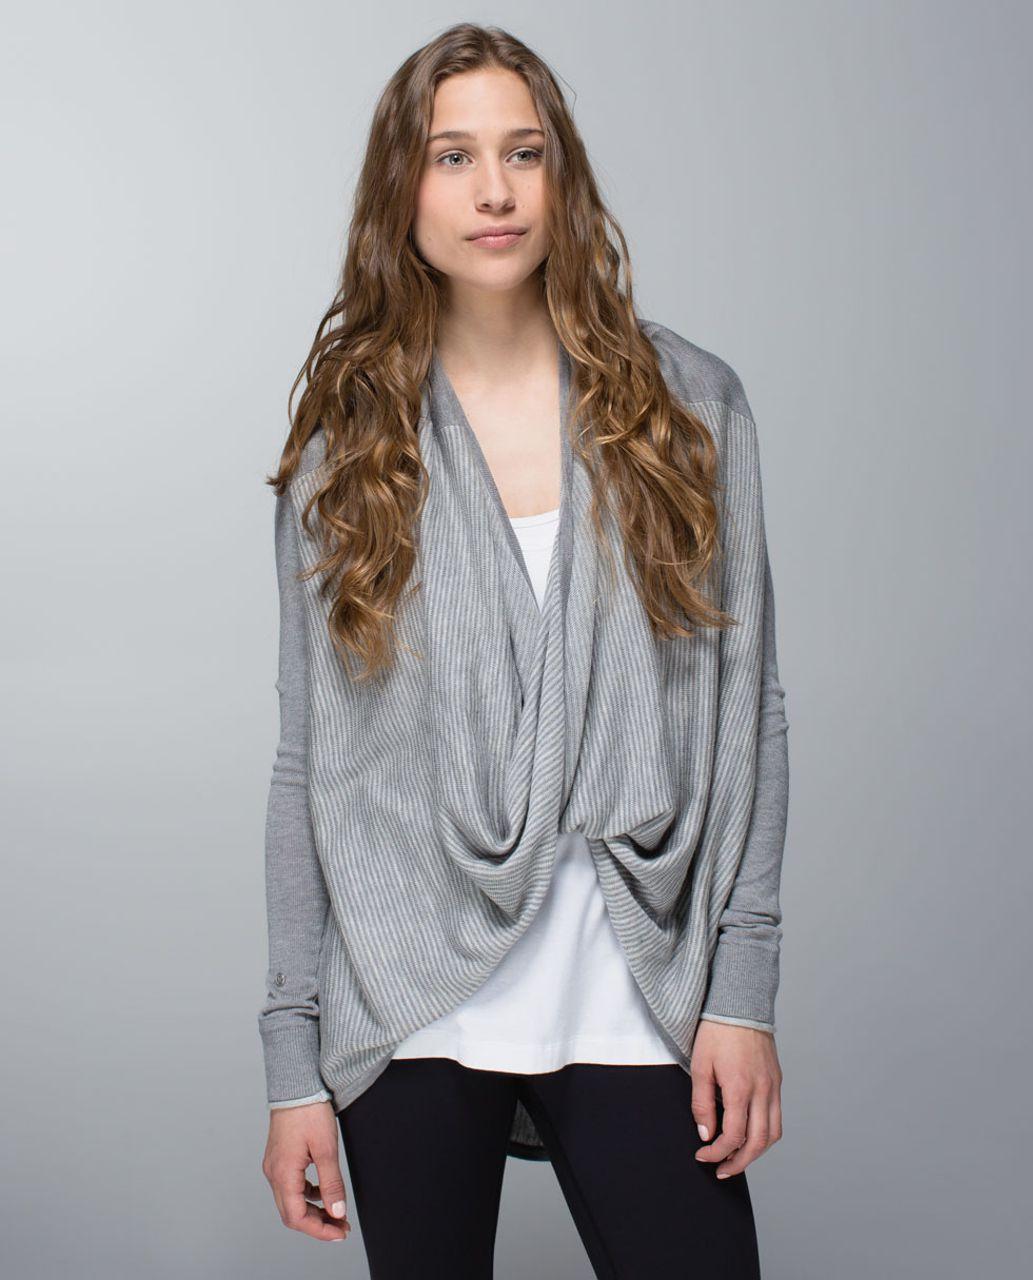 705a61aa4c Lululemon Iconic Sweater Wrap - Heathered Medium Grey   Heathered Light Grey  - lulu fanatics